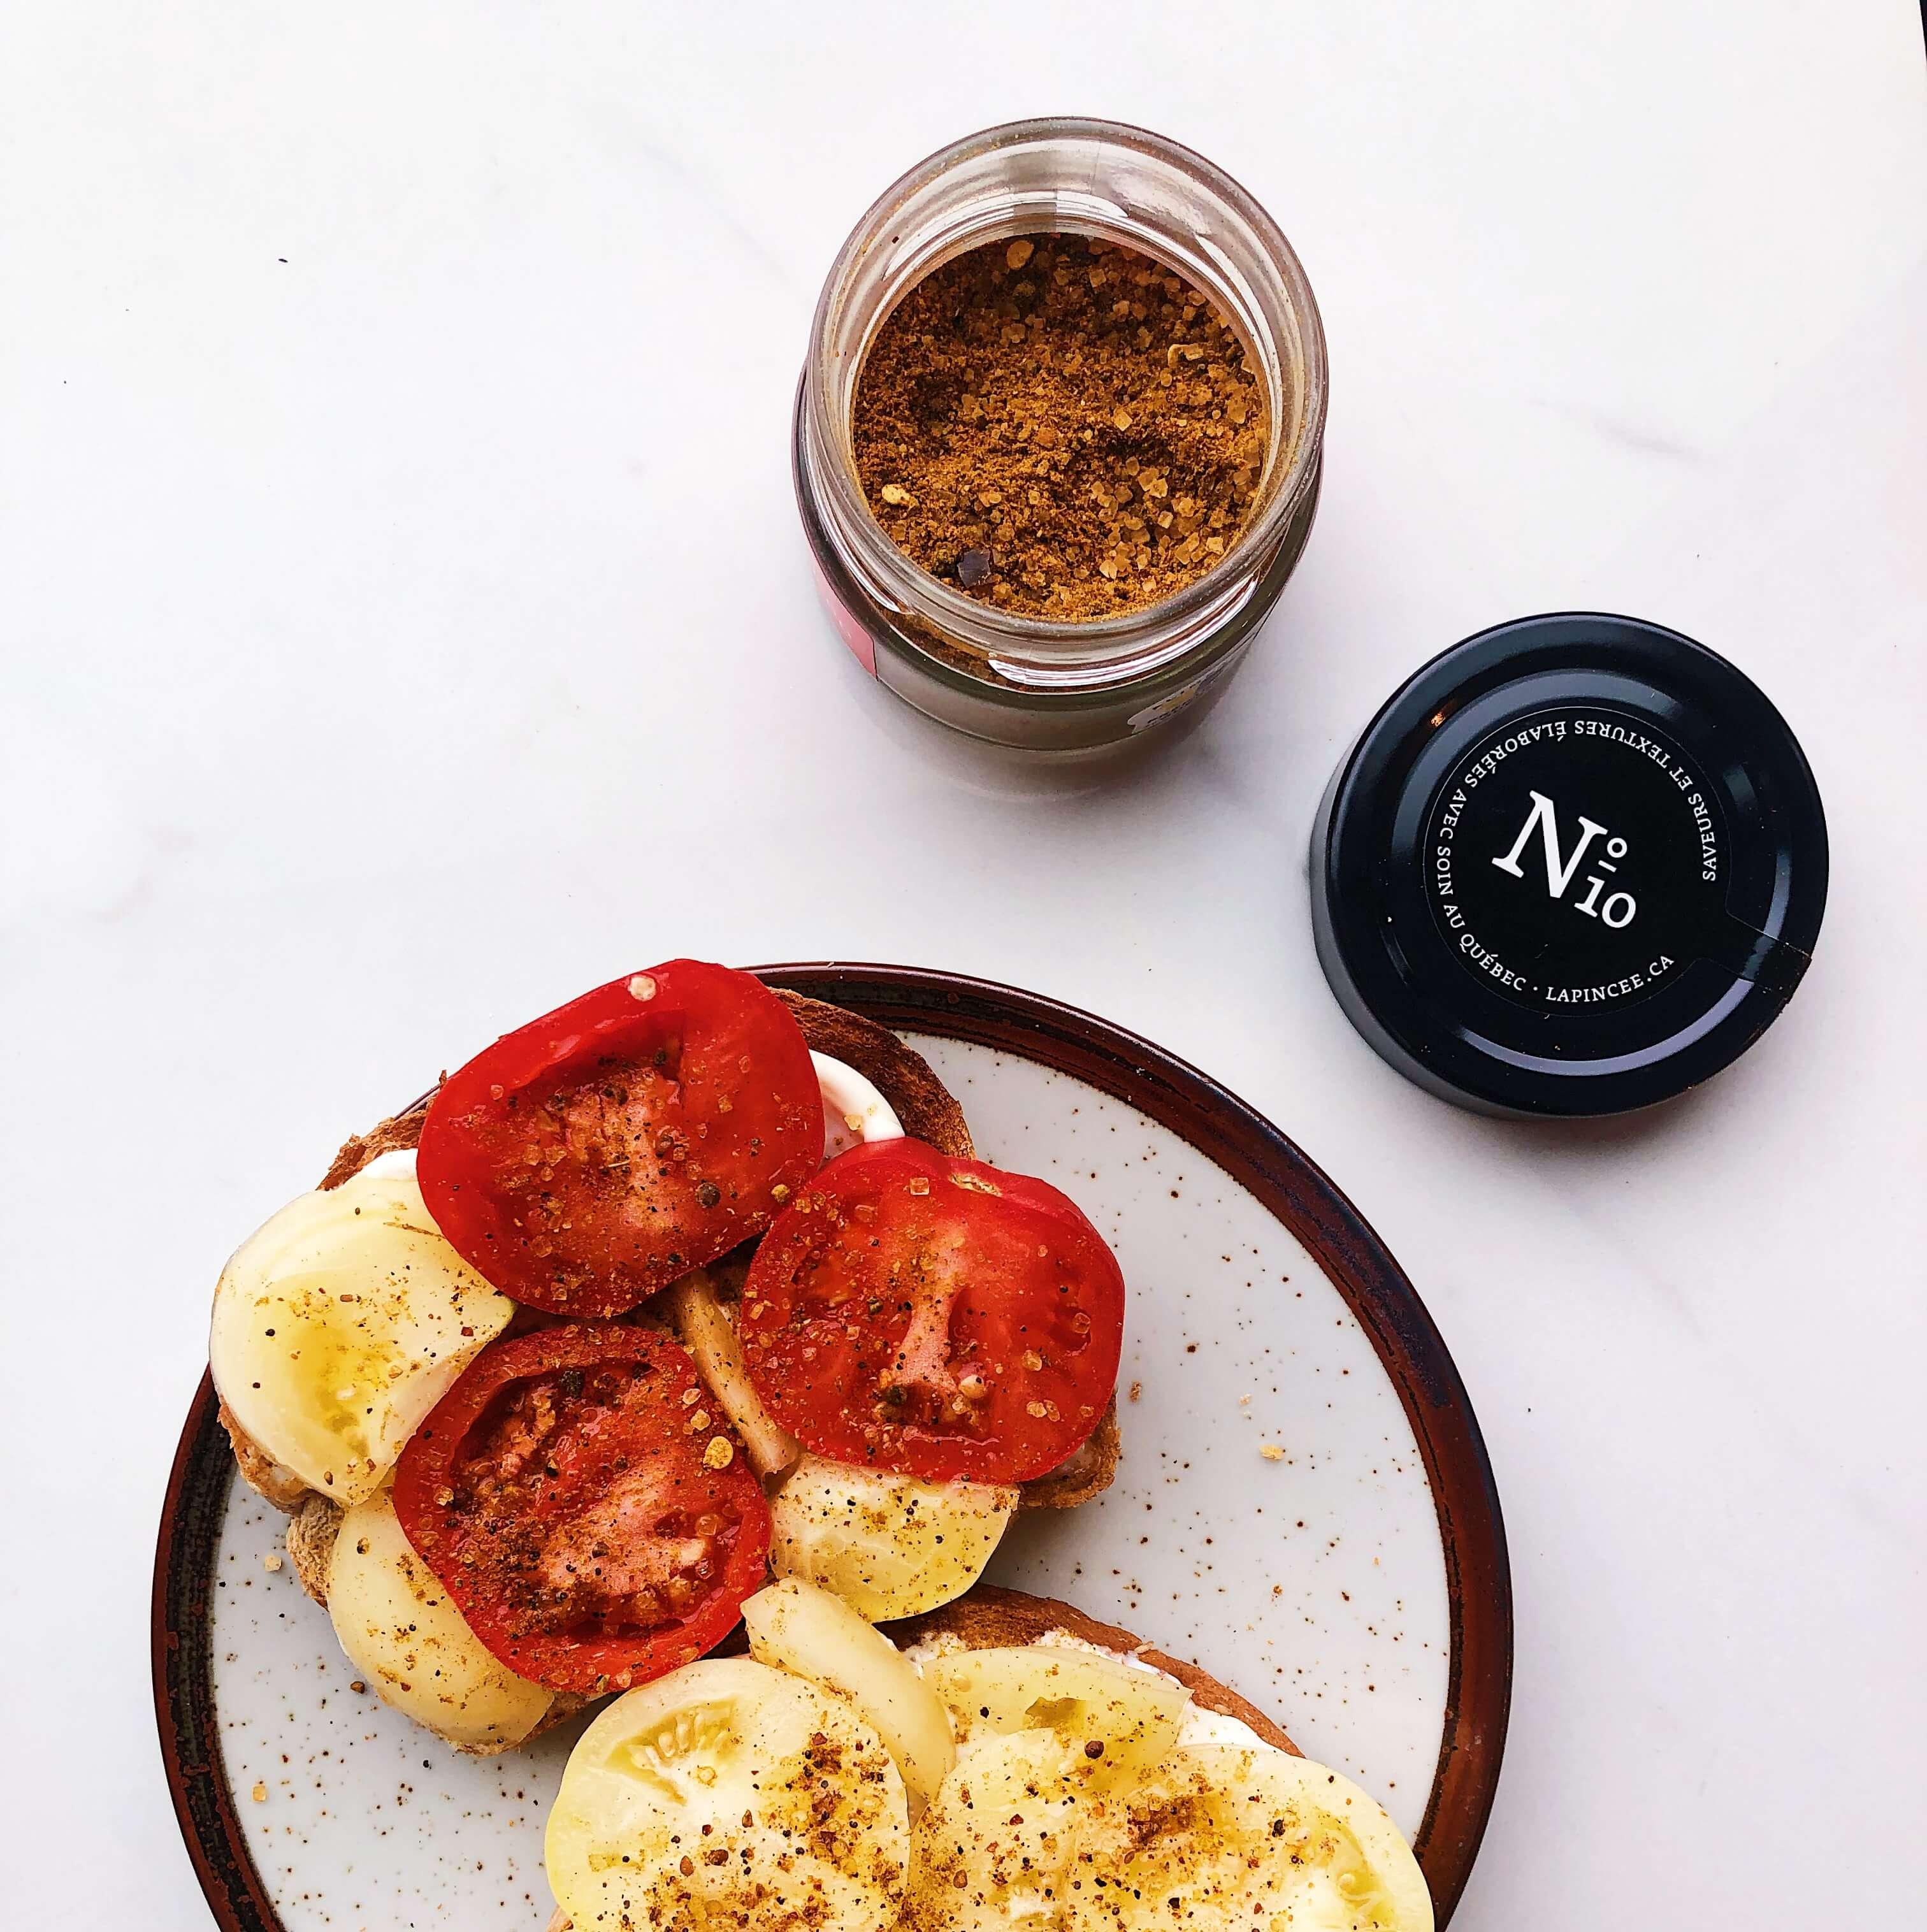 Tomato on toast with fancy salt from La Pincée